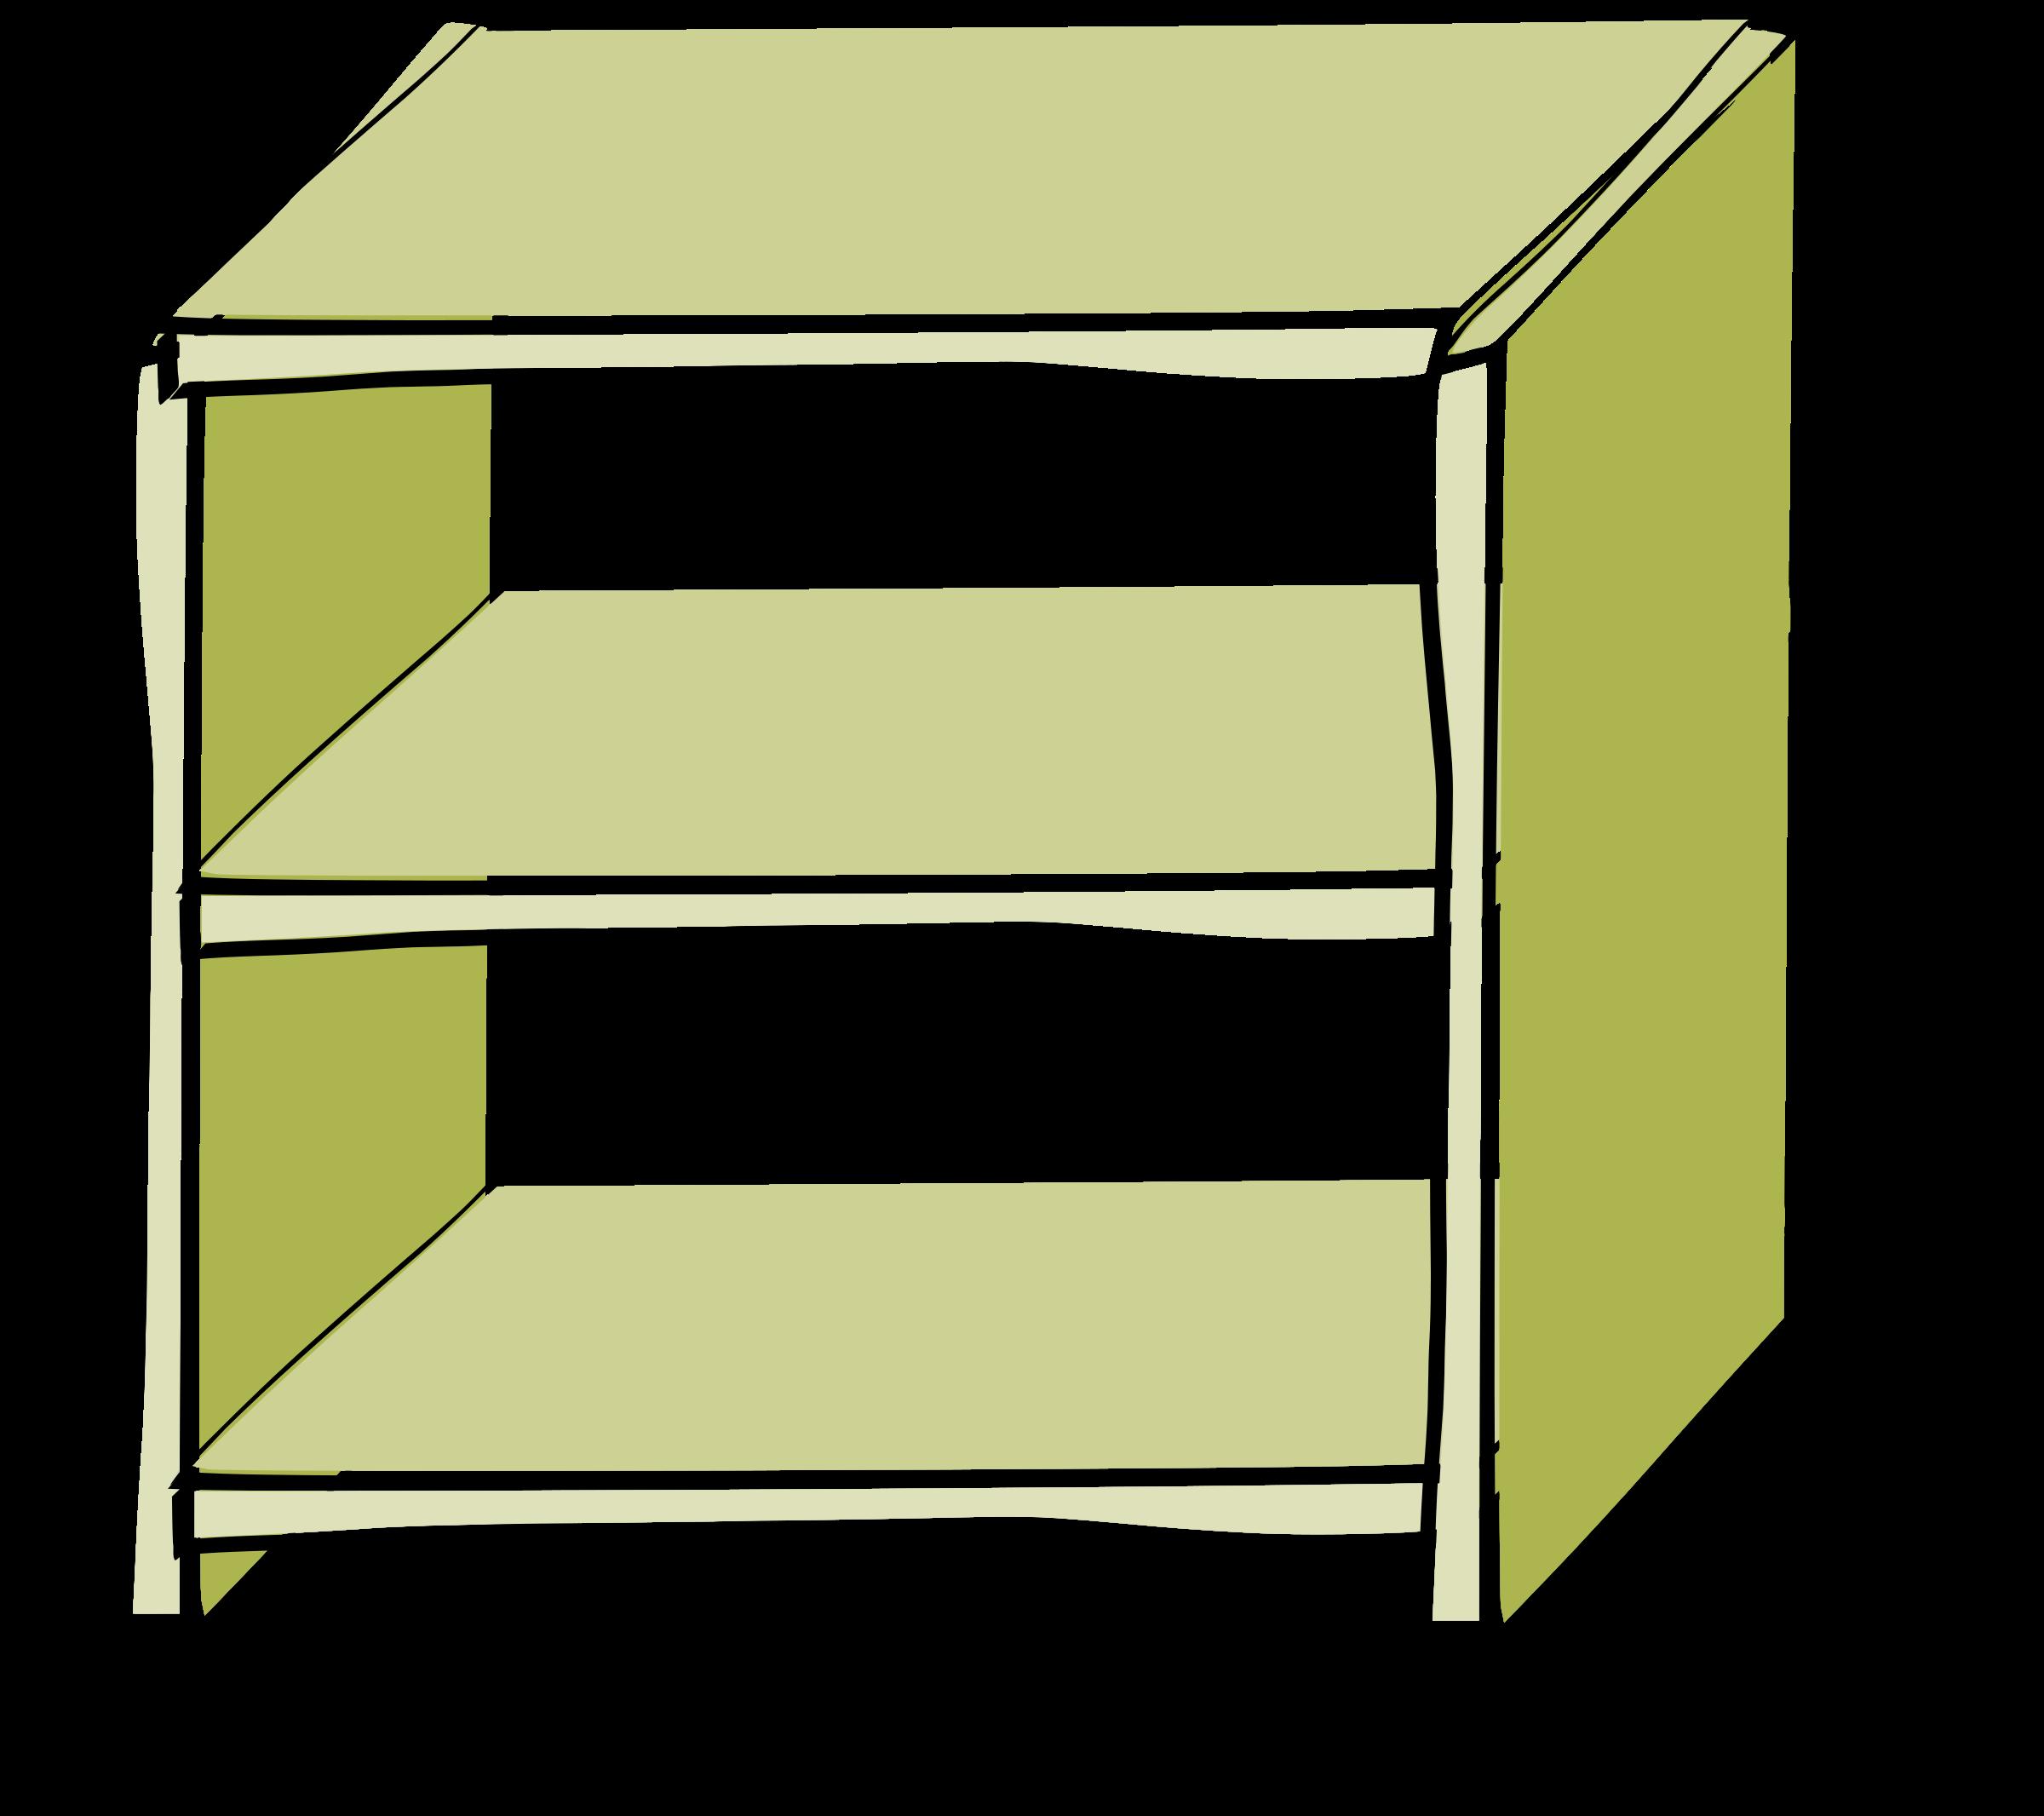 clipart transparent download Clipart comic style shelves. Bookshelf vector cabinet